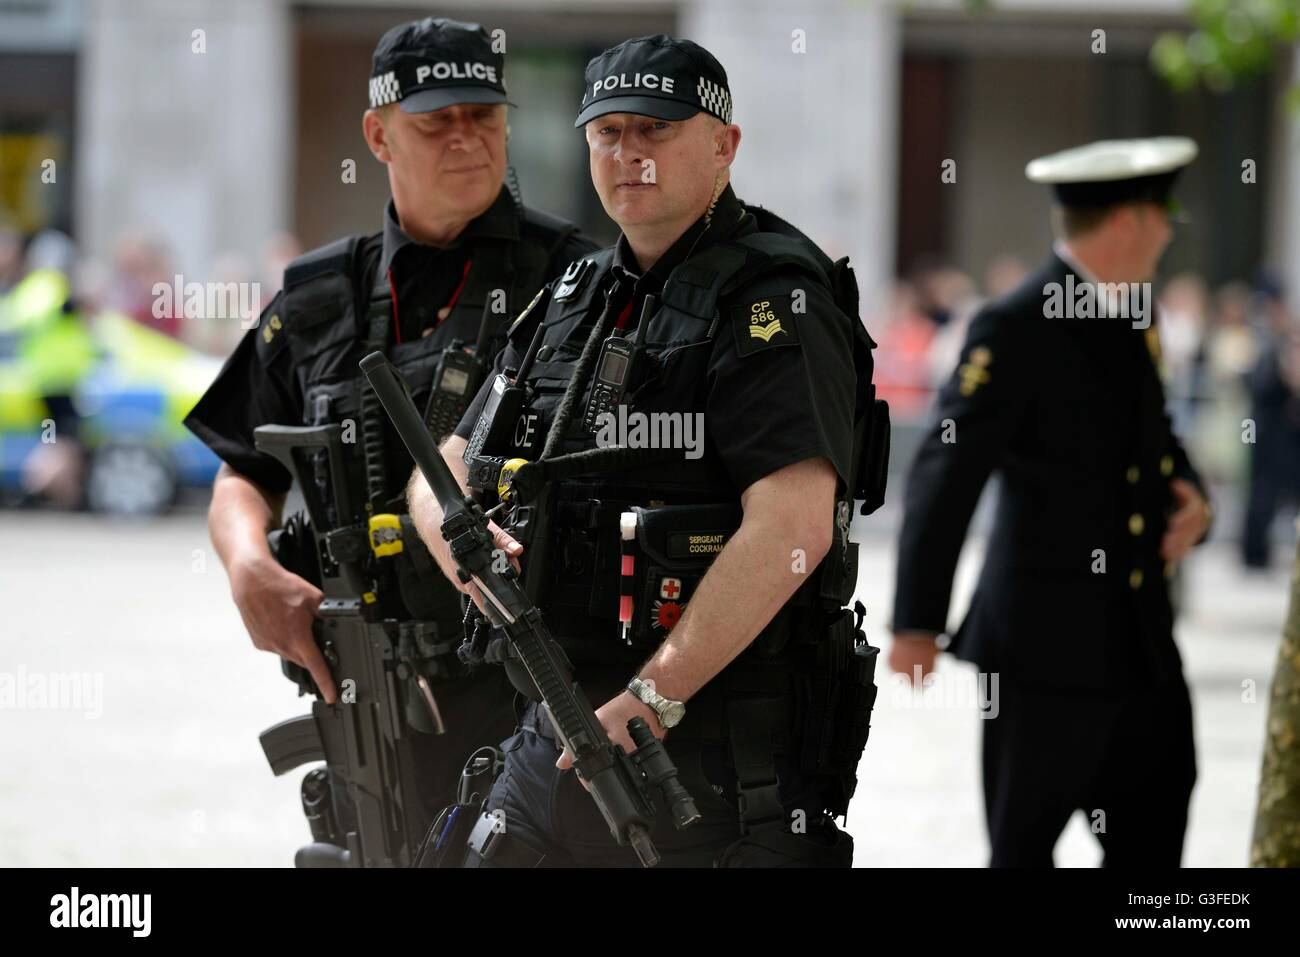 Bewaffnete Polizei, London, England, UK Stockbild